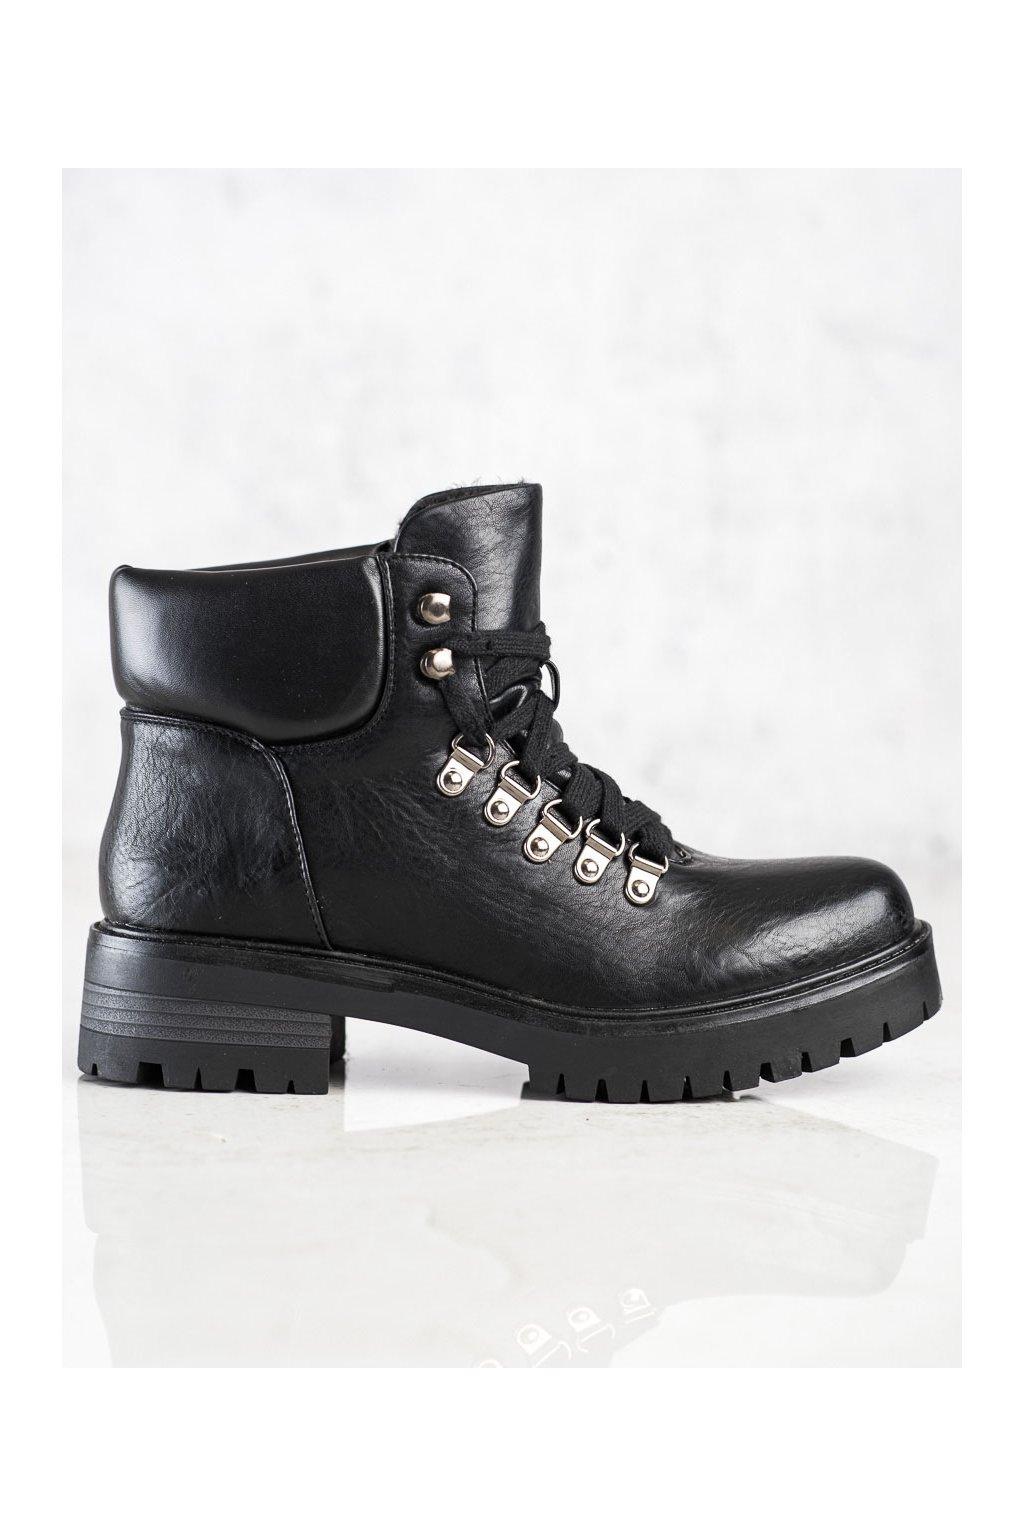 Čierne dámske topánky Ideal shoes kod TX-1833B